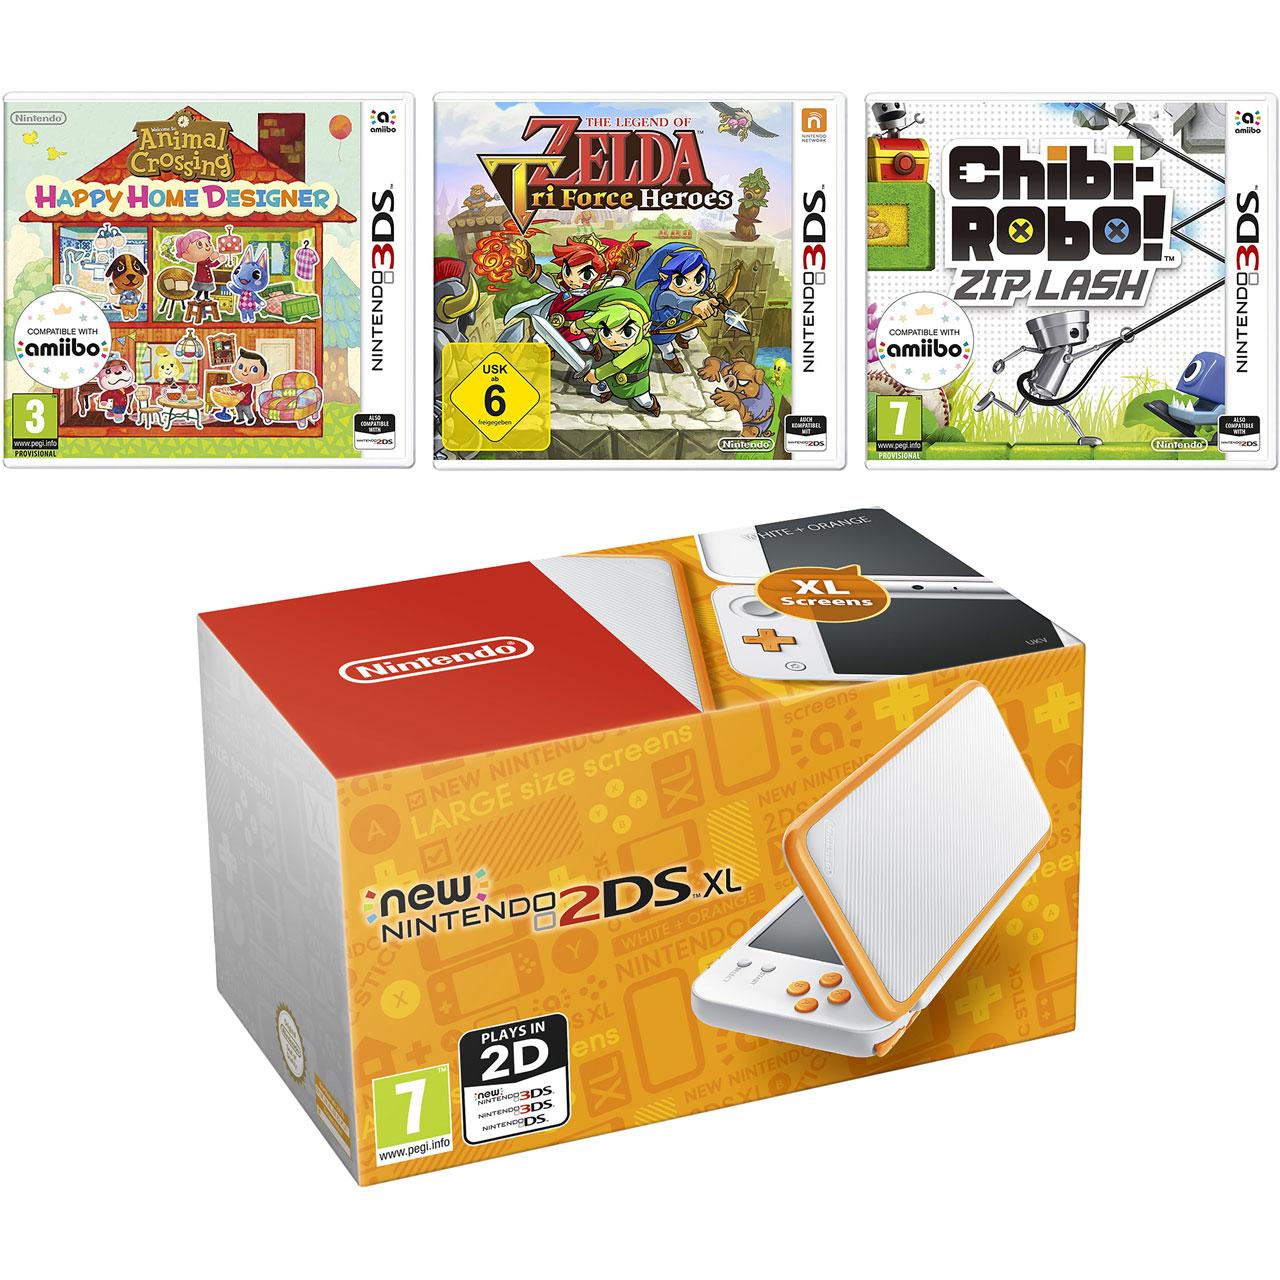 Nintendo 2DS XL 4GB with Animal Crossing Happy Home Designer, The Legend Of  Zelda: Tri Force Heroes and Chibi Robo: Zip Lash - White / Orange